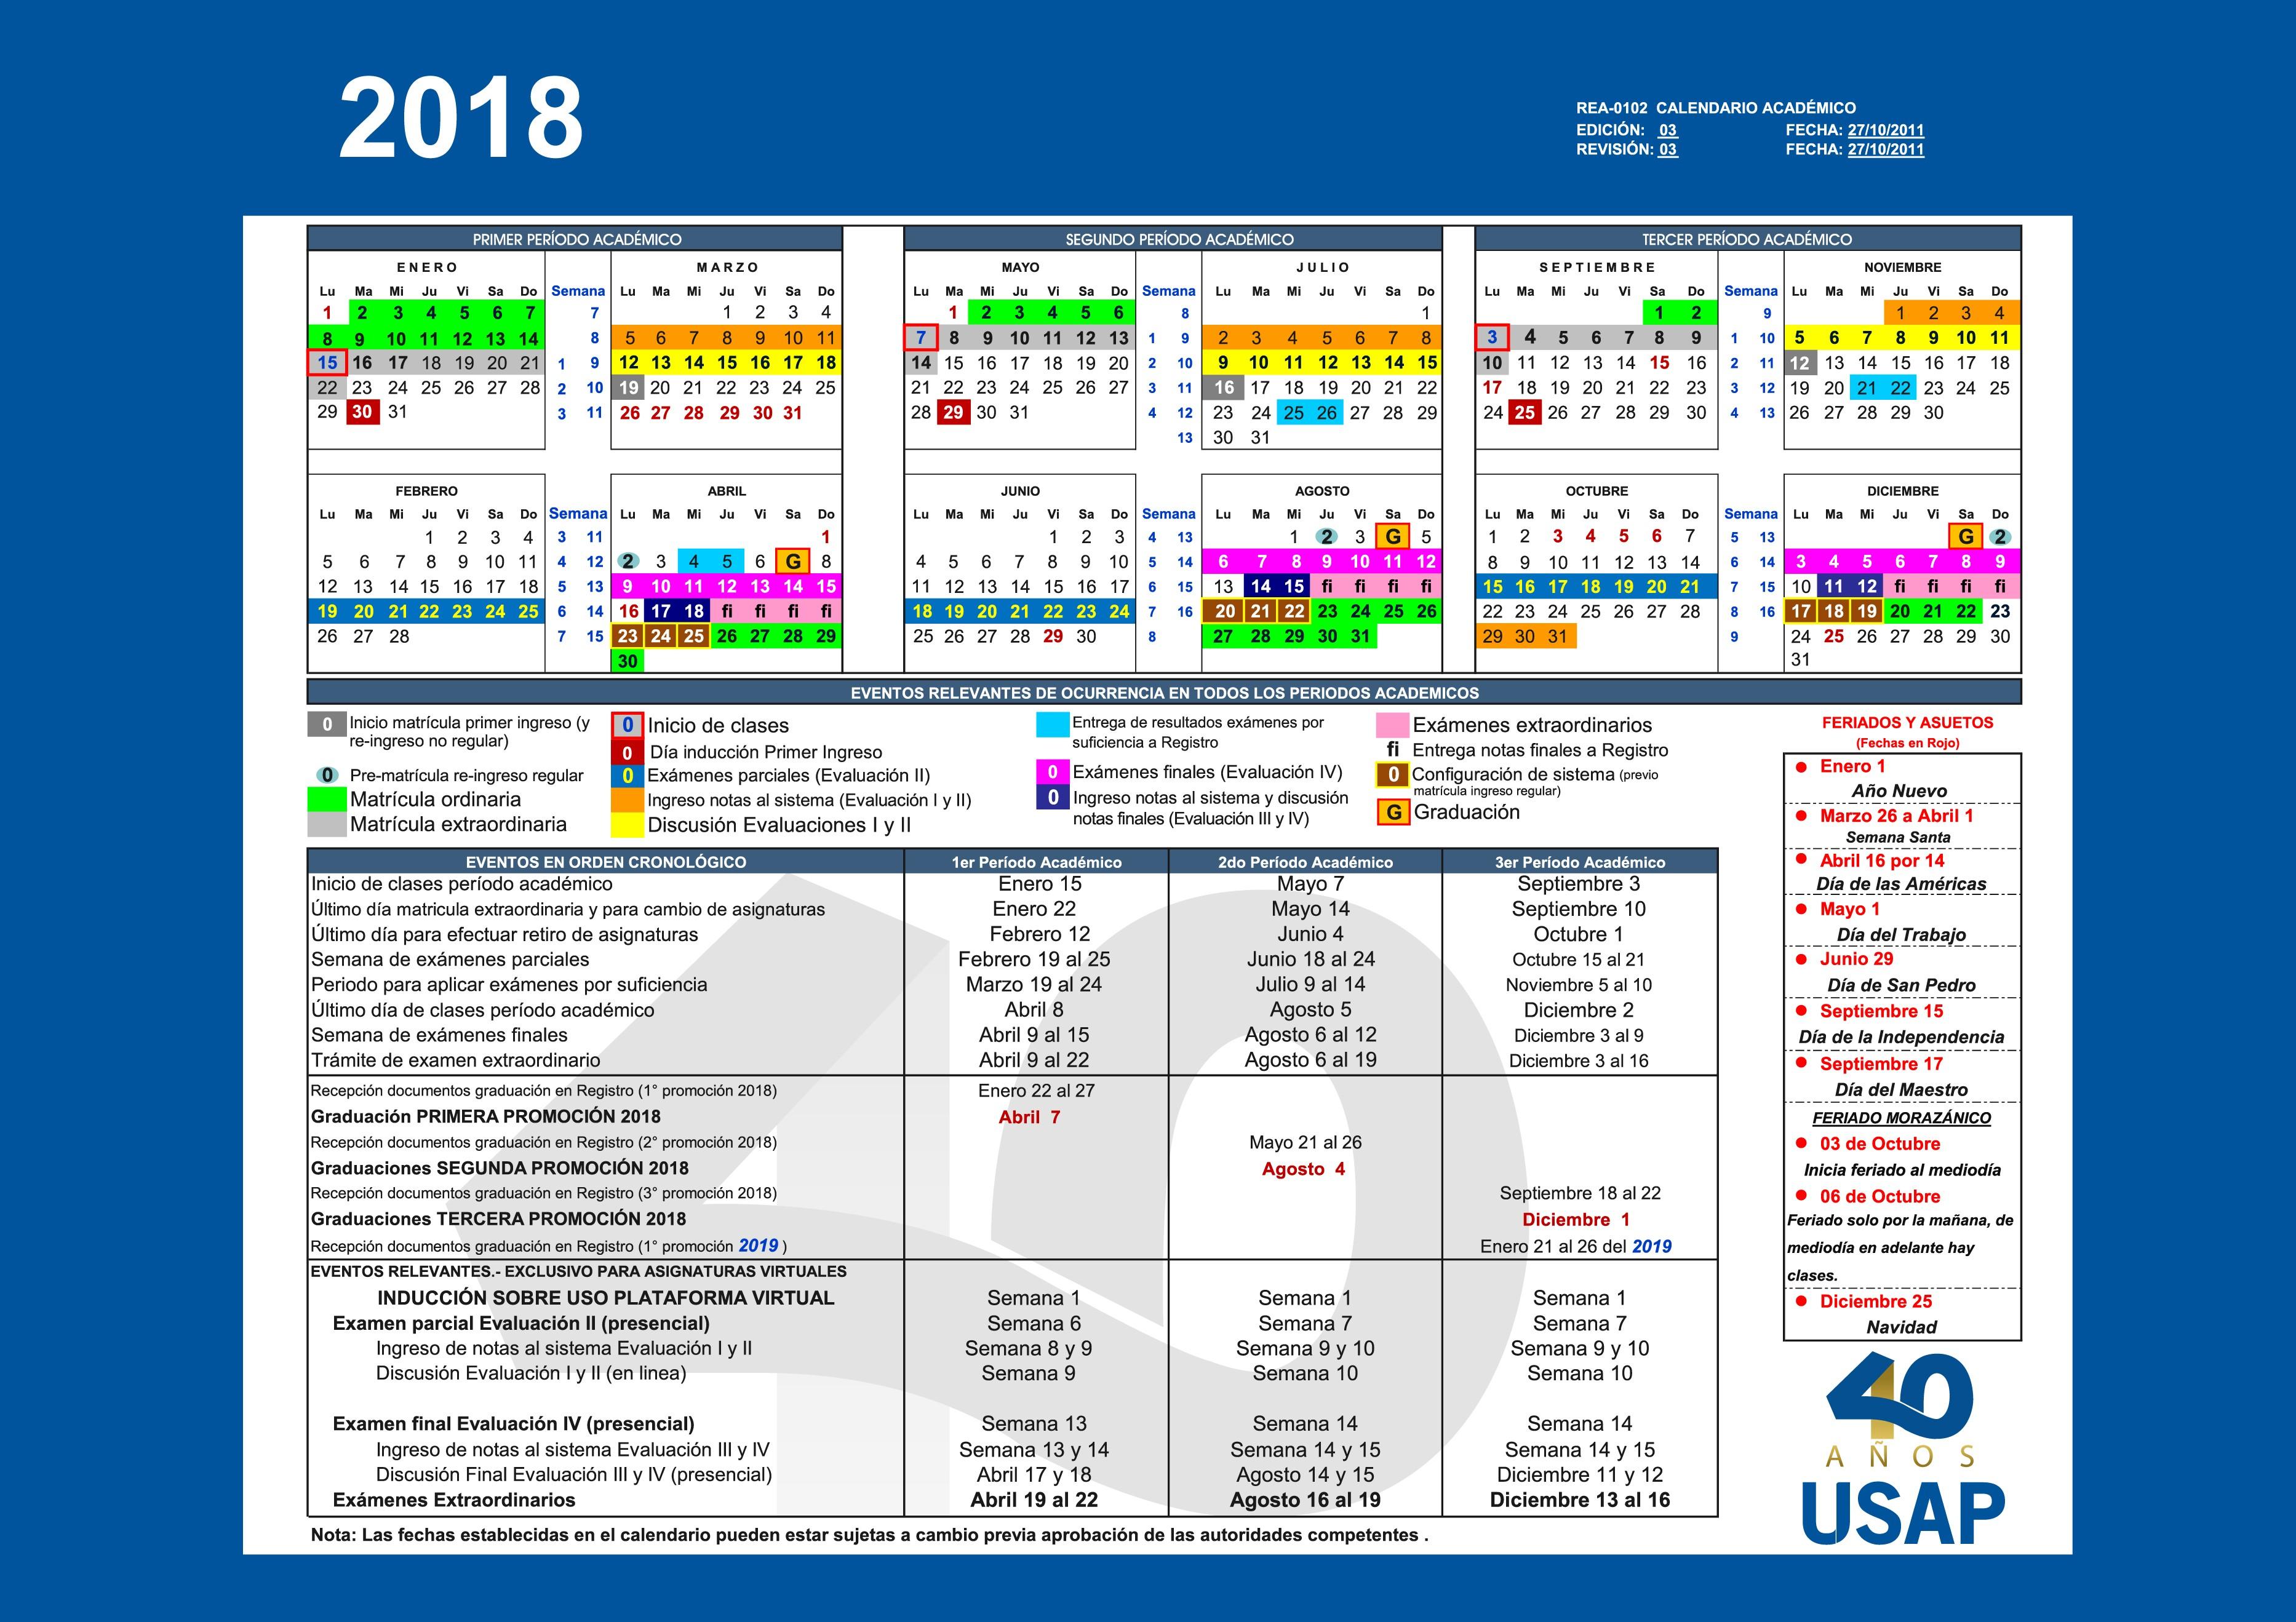 Calendario Semana Santa 2019 Honduras Más Arriba-a-fecha Calendario Octubre 2018 Colombia T Of Calendario Semana Santa 2019 Honduras Más Recientes Kit Argentina Copa América 2019 No Oficial